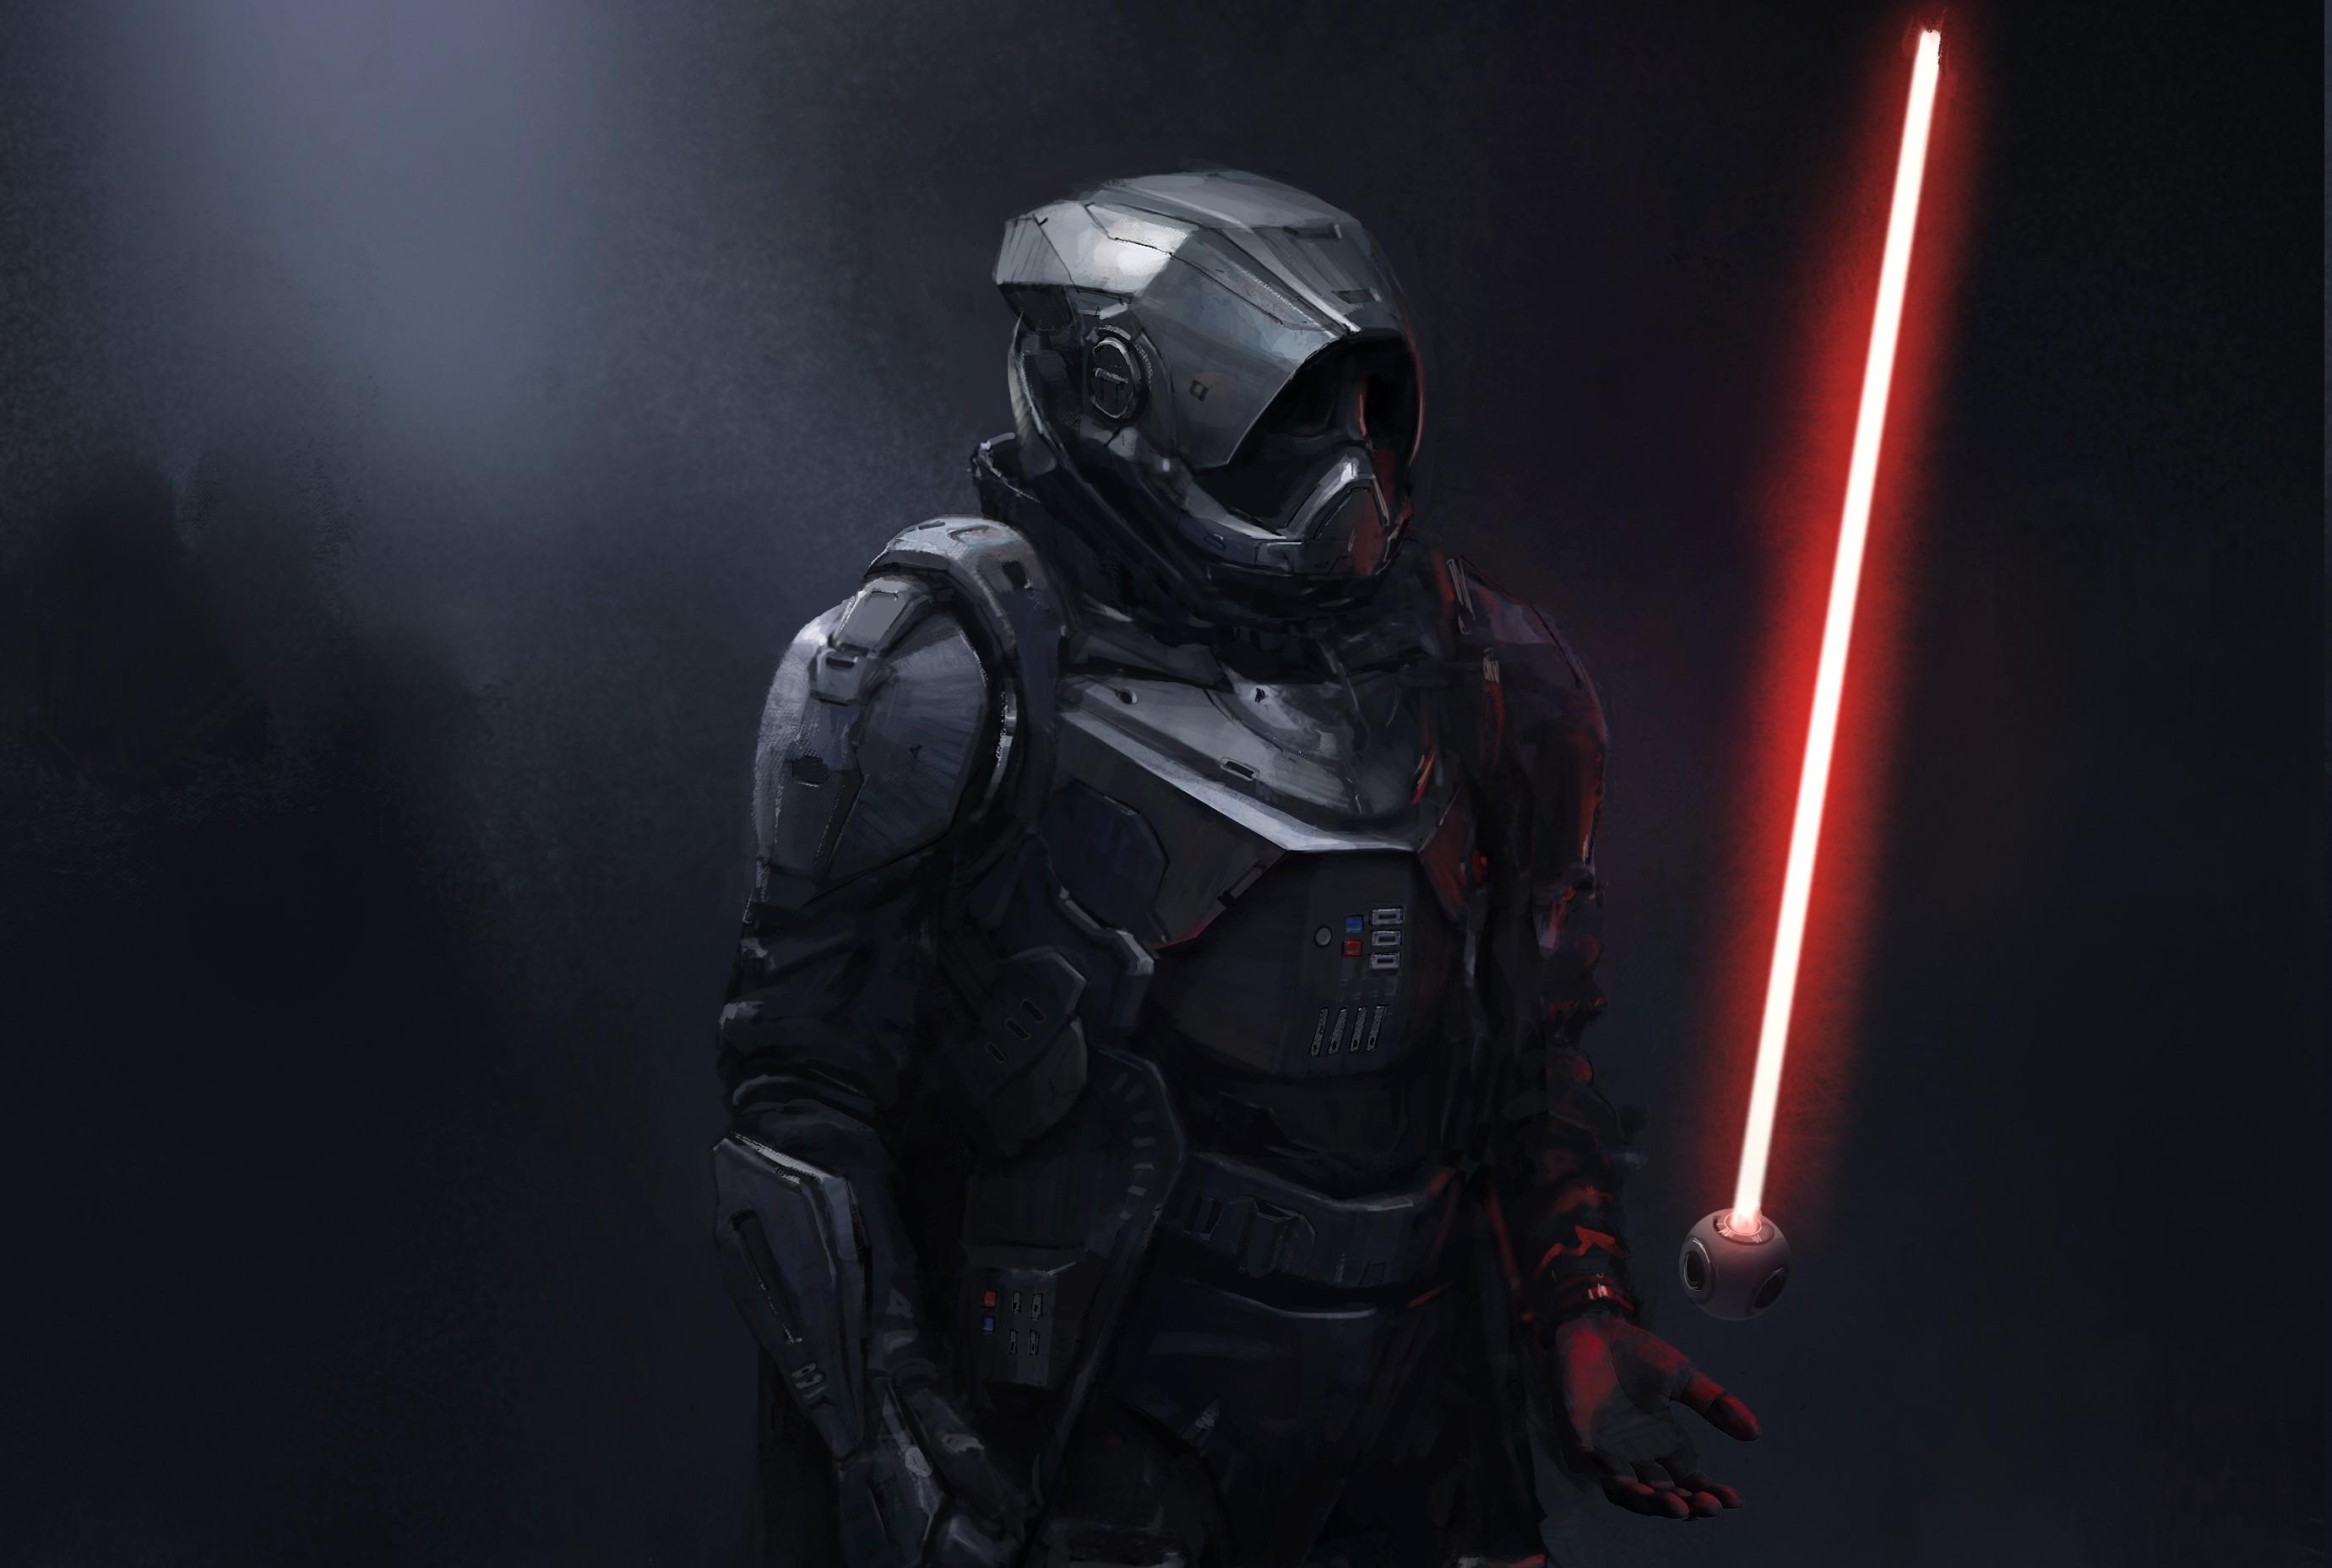 Wallpaper 2761x1857 Px Lightsaber Sith Star Wars 2761x1857